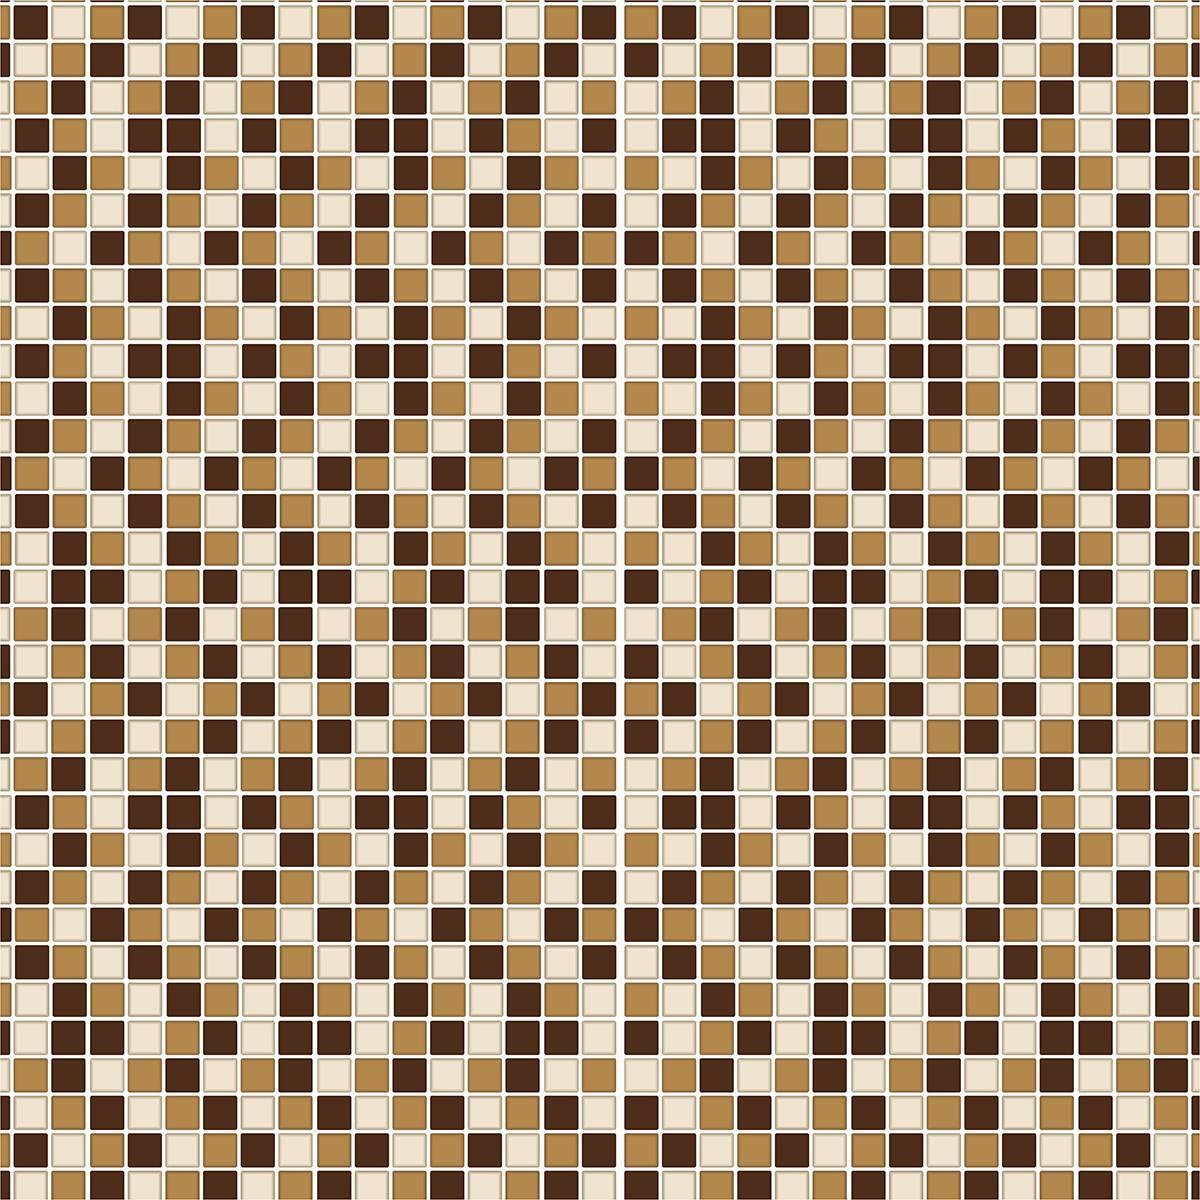 Papel De Parede Adesivo Pastilha Mesclado Marrom 300x52cm - LCGELETRO